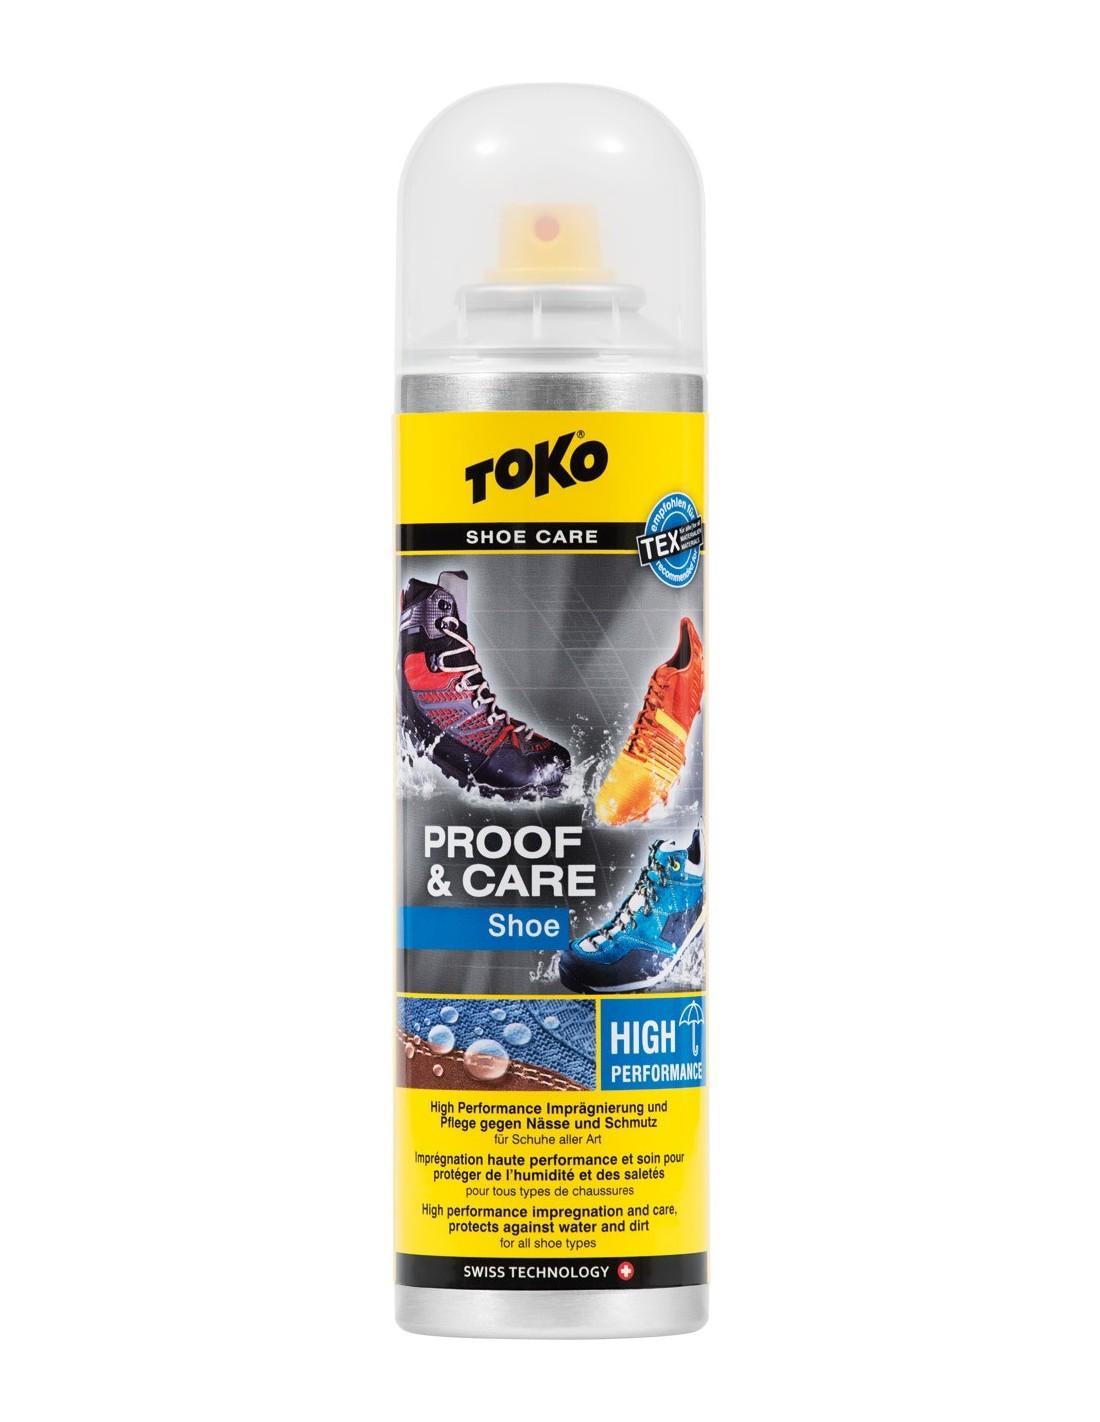 Toko Shoe Proof & Care Pflegeart - Imprägnierung,